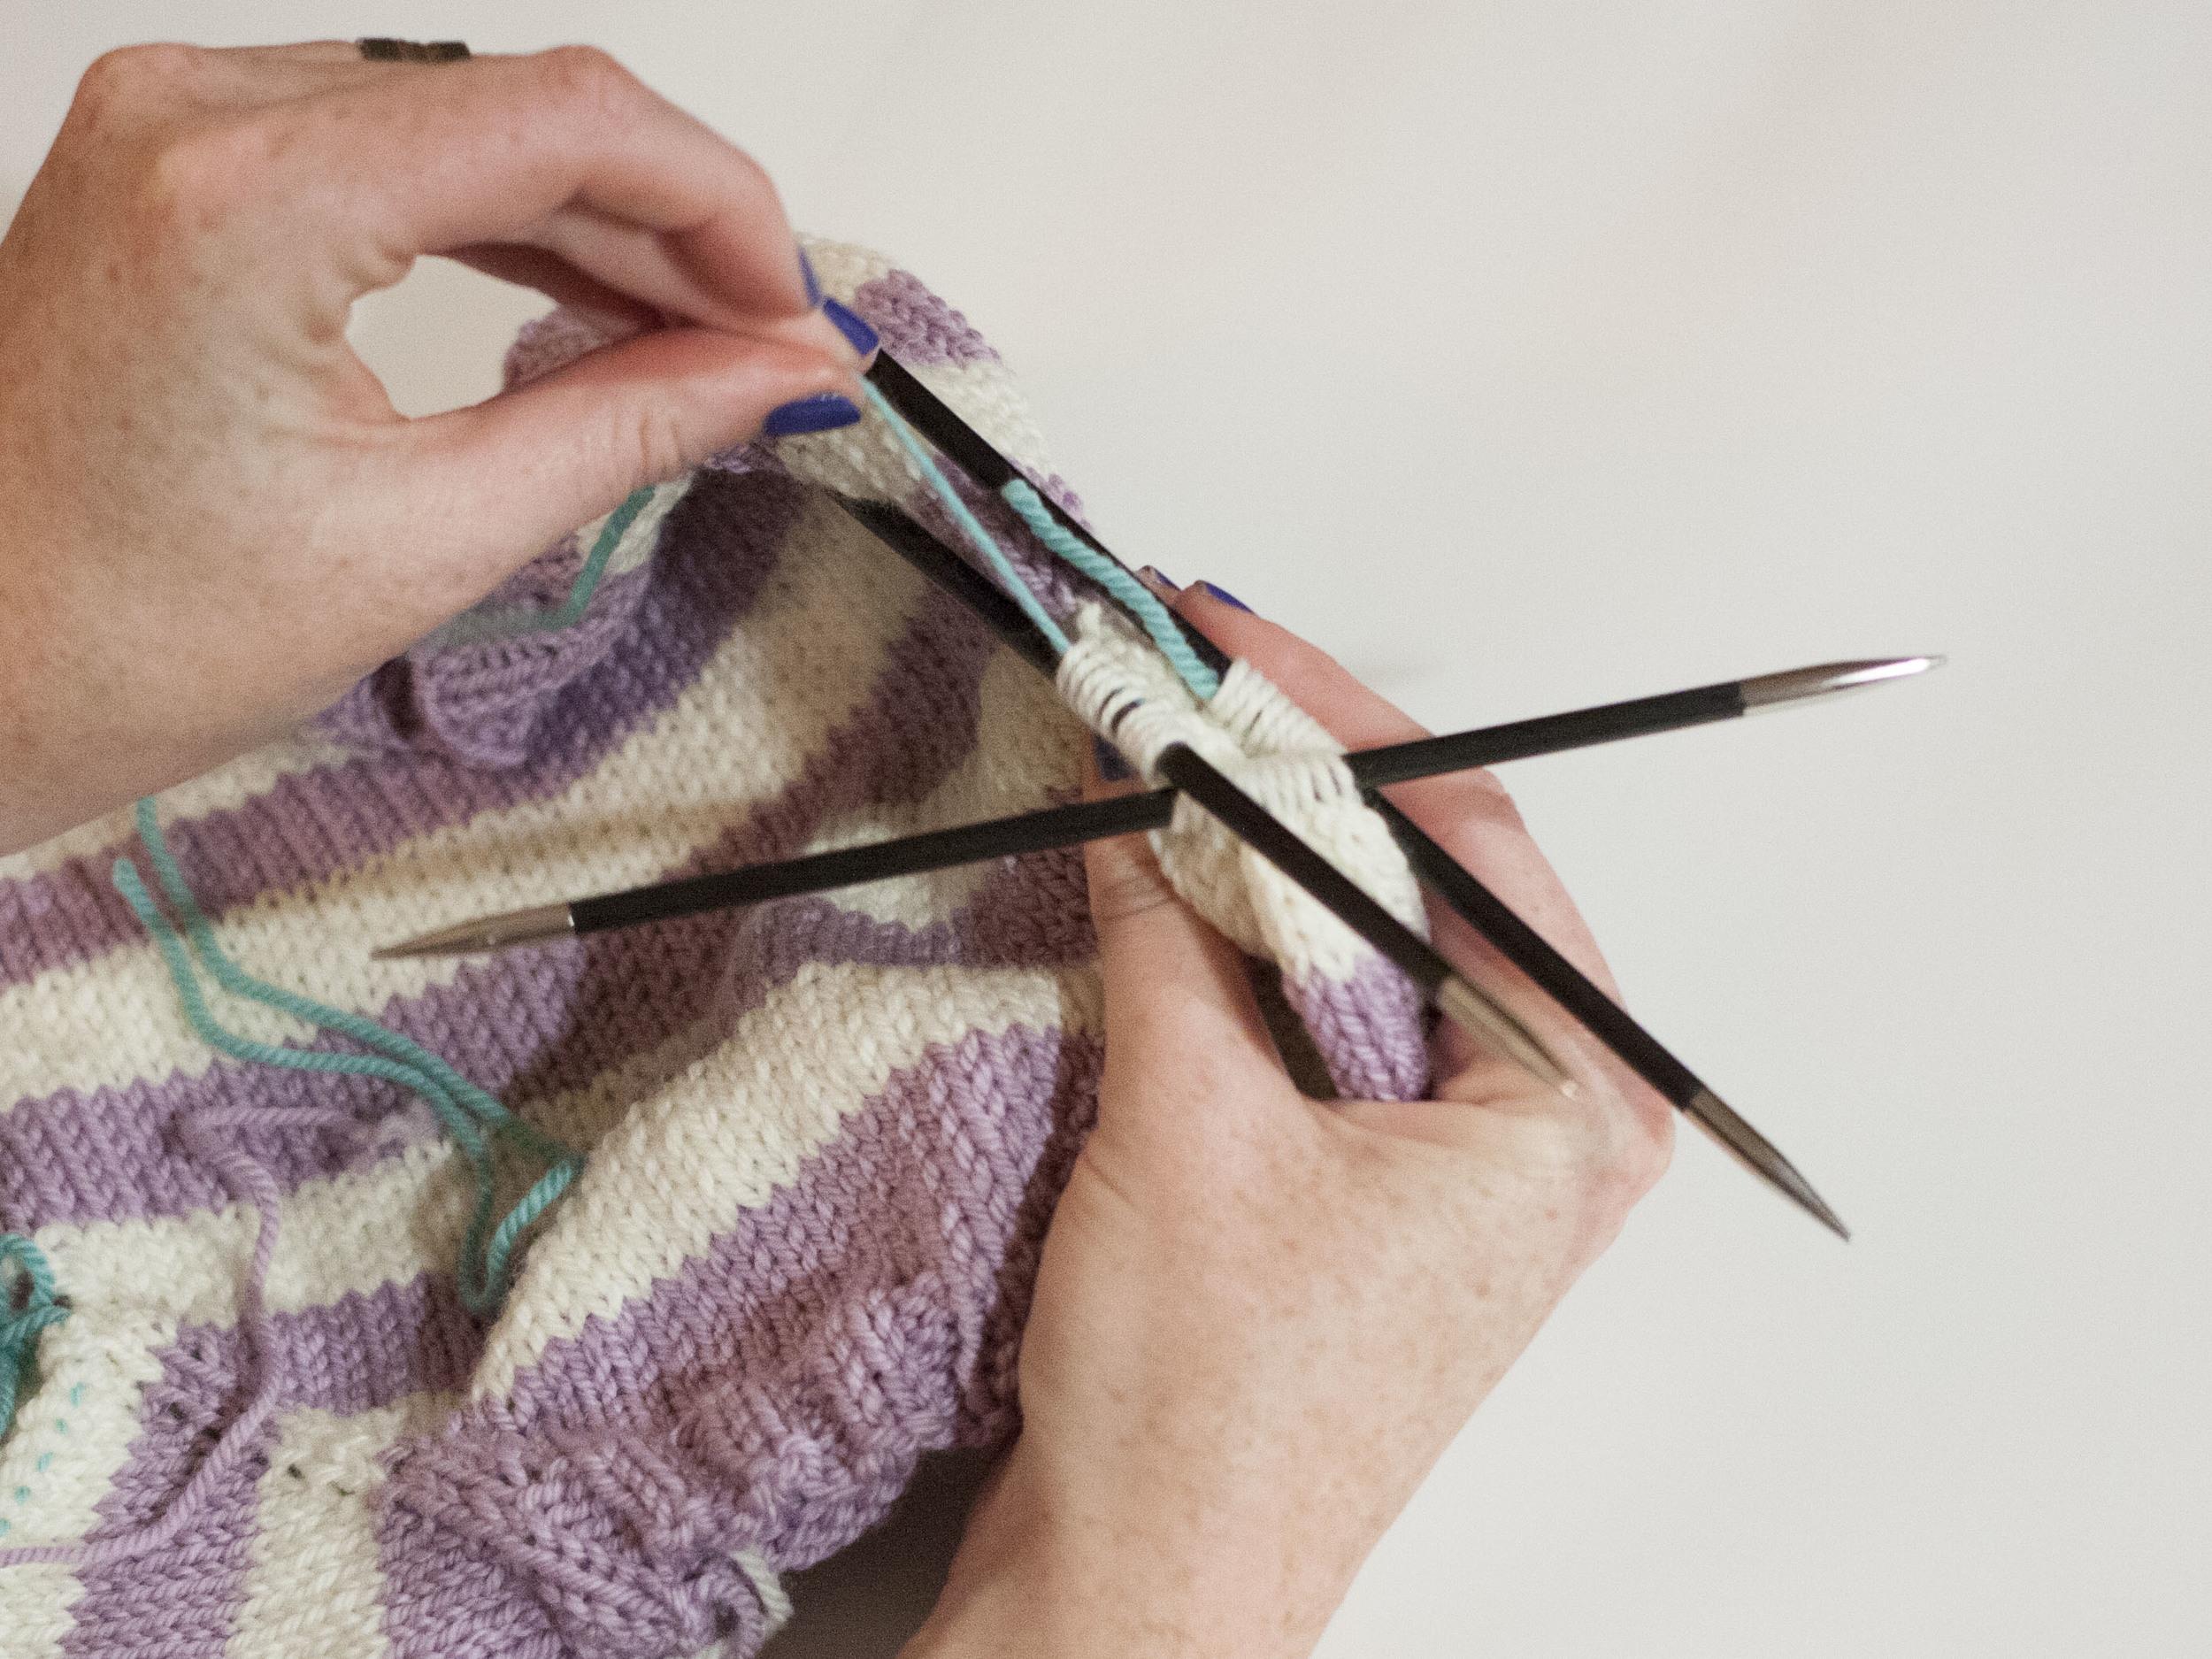 Removing a stitch holder